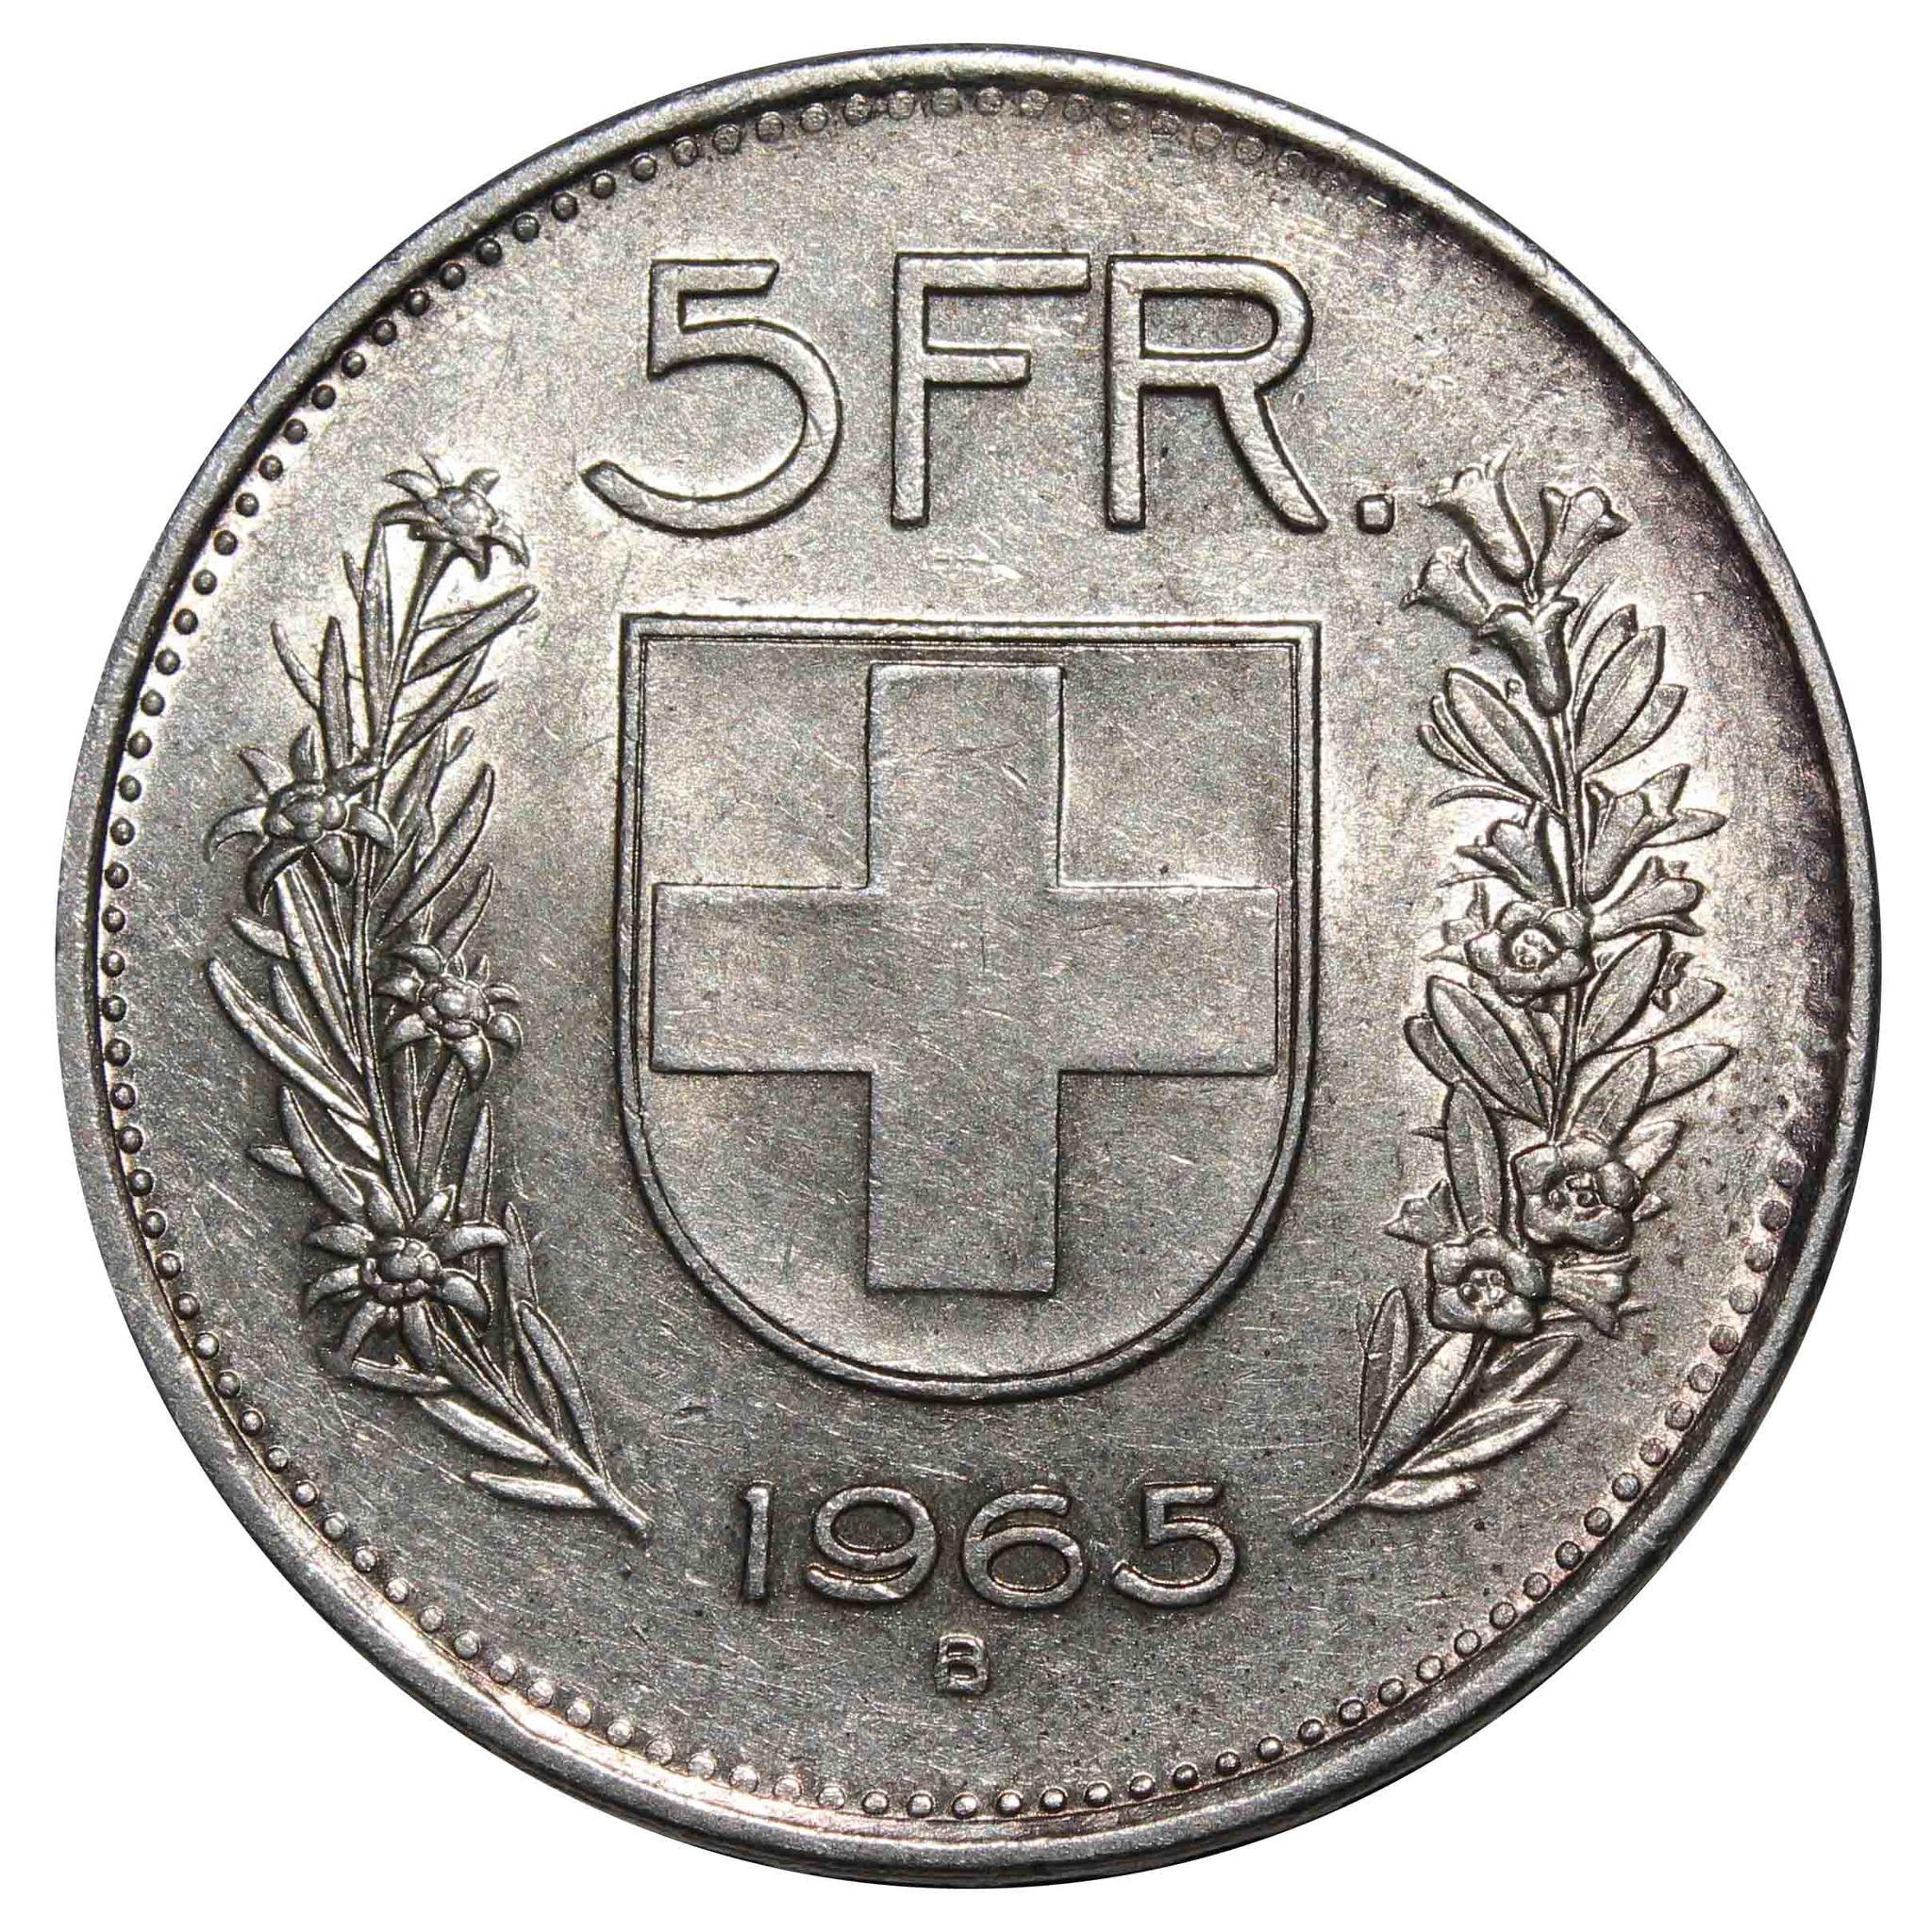 5 франков. Швейцария. 1965 год. Серебро. XF-AU